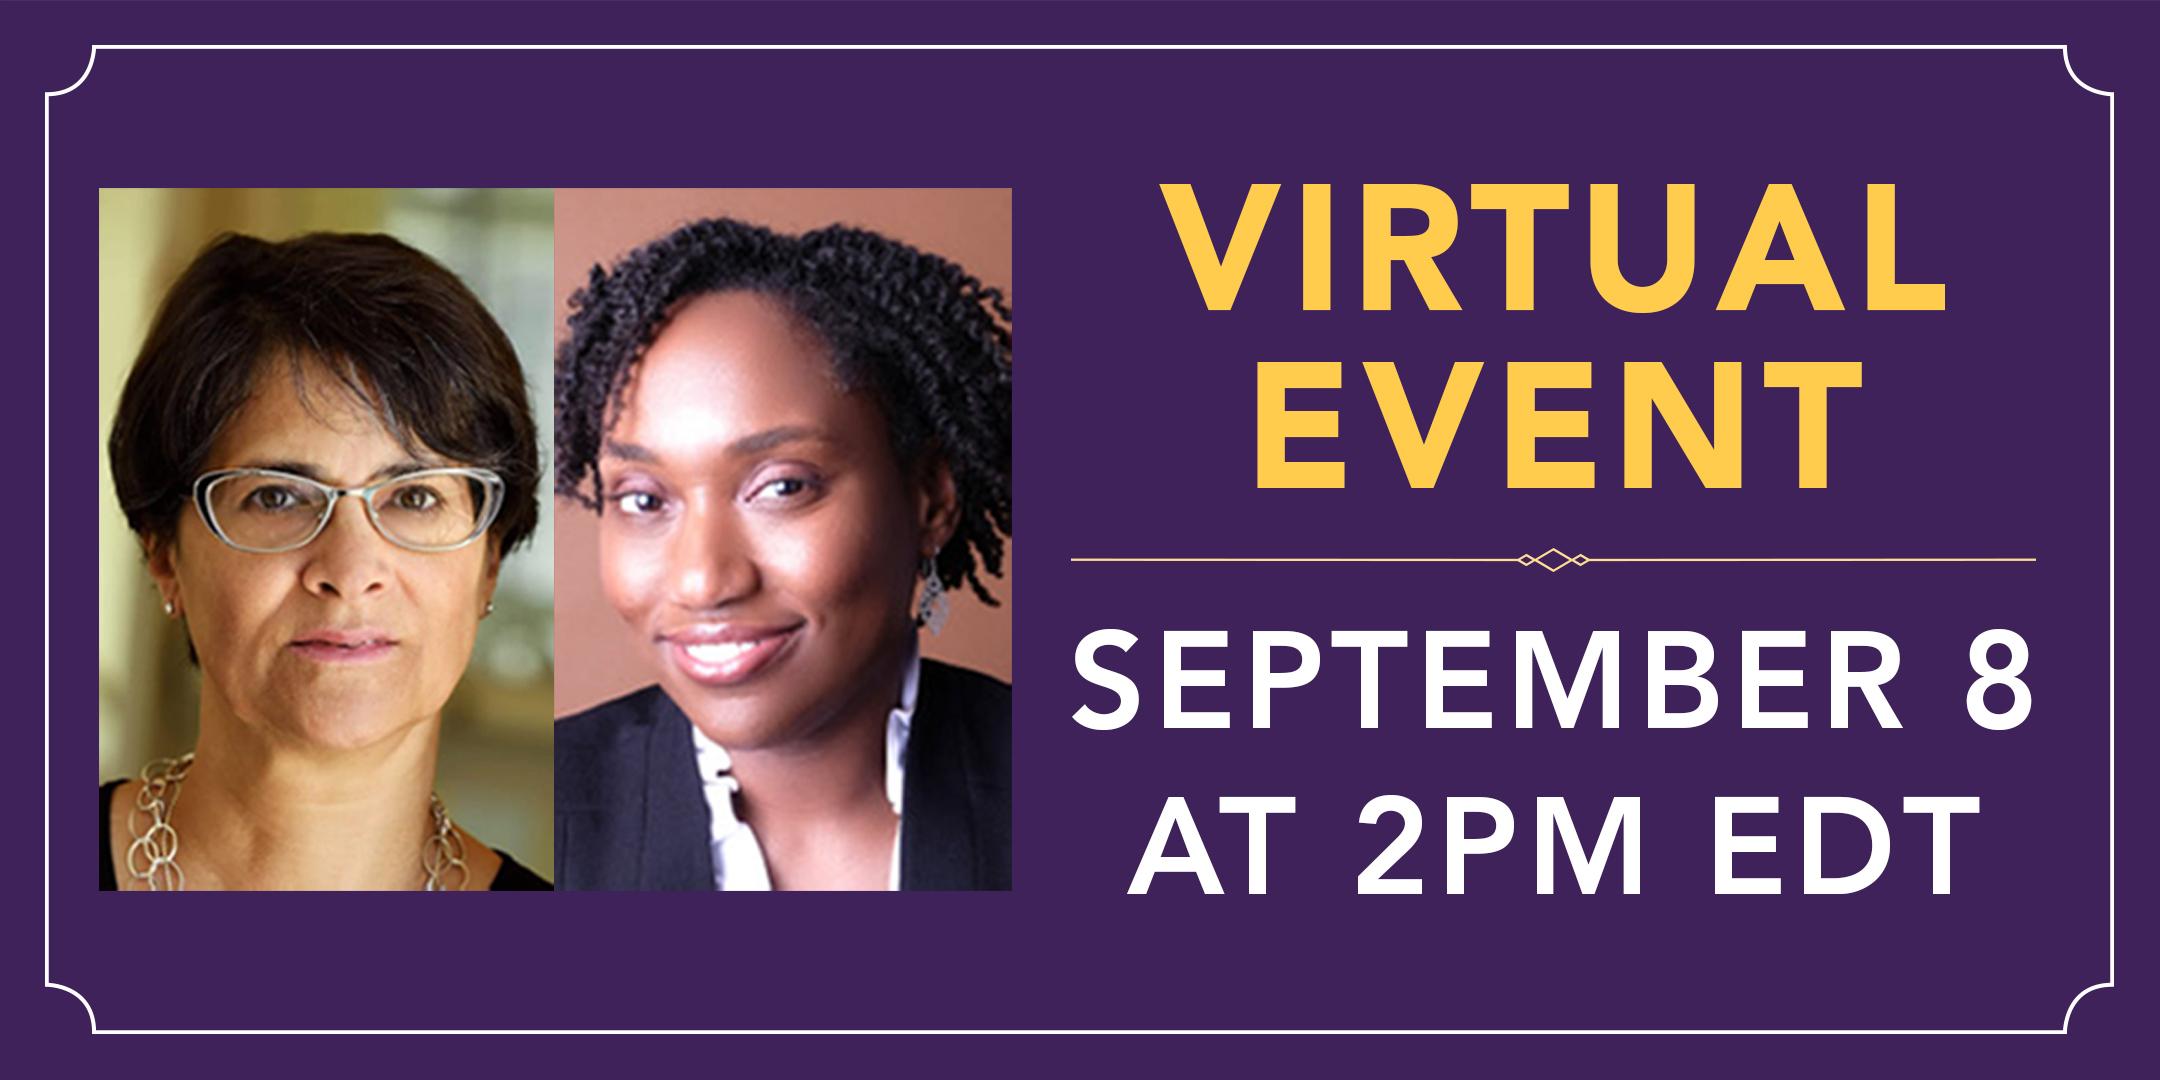 Vanguard event